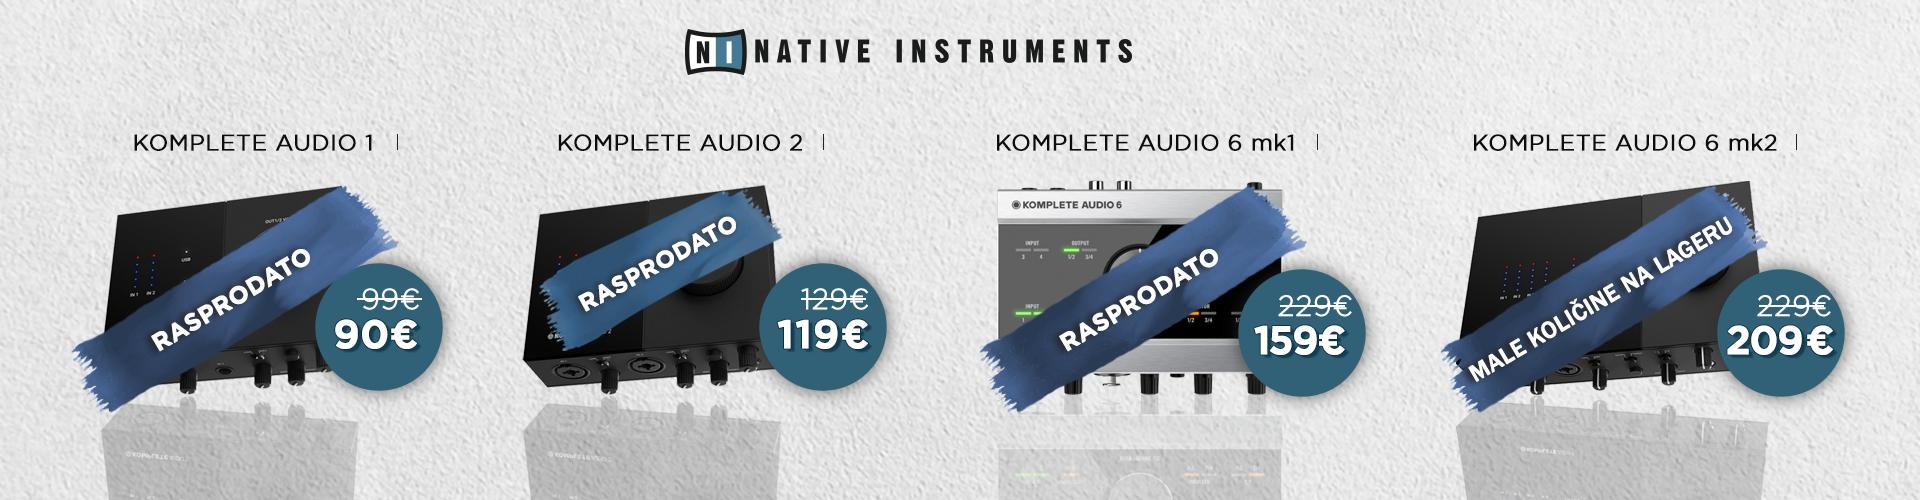 Native Instruments Komplete Audio